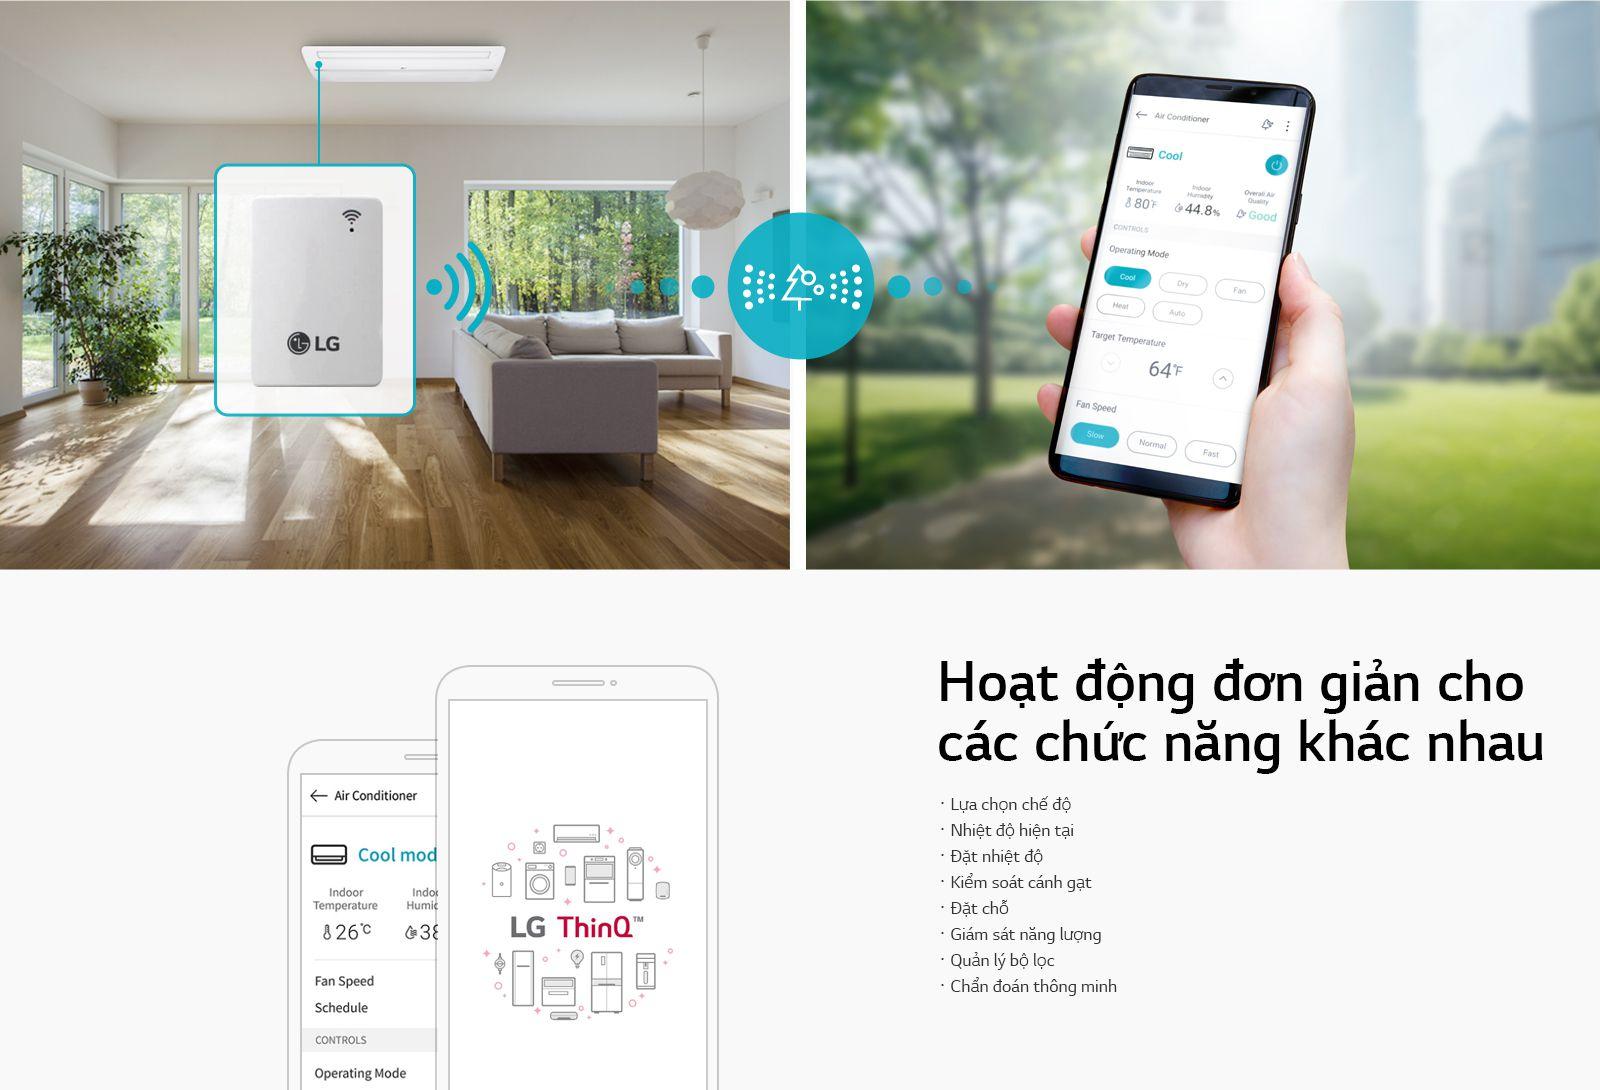 Điều khiển từ xa Wi-Fi với LG ThinQ™1